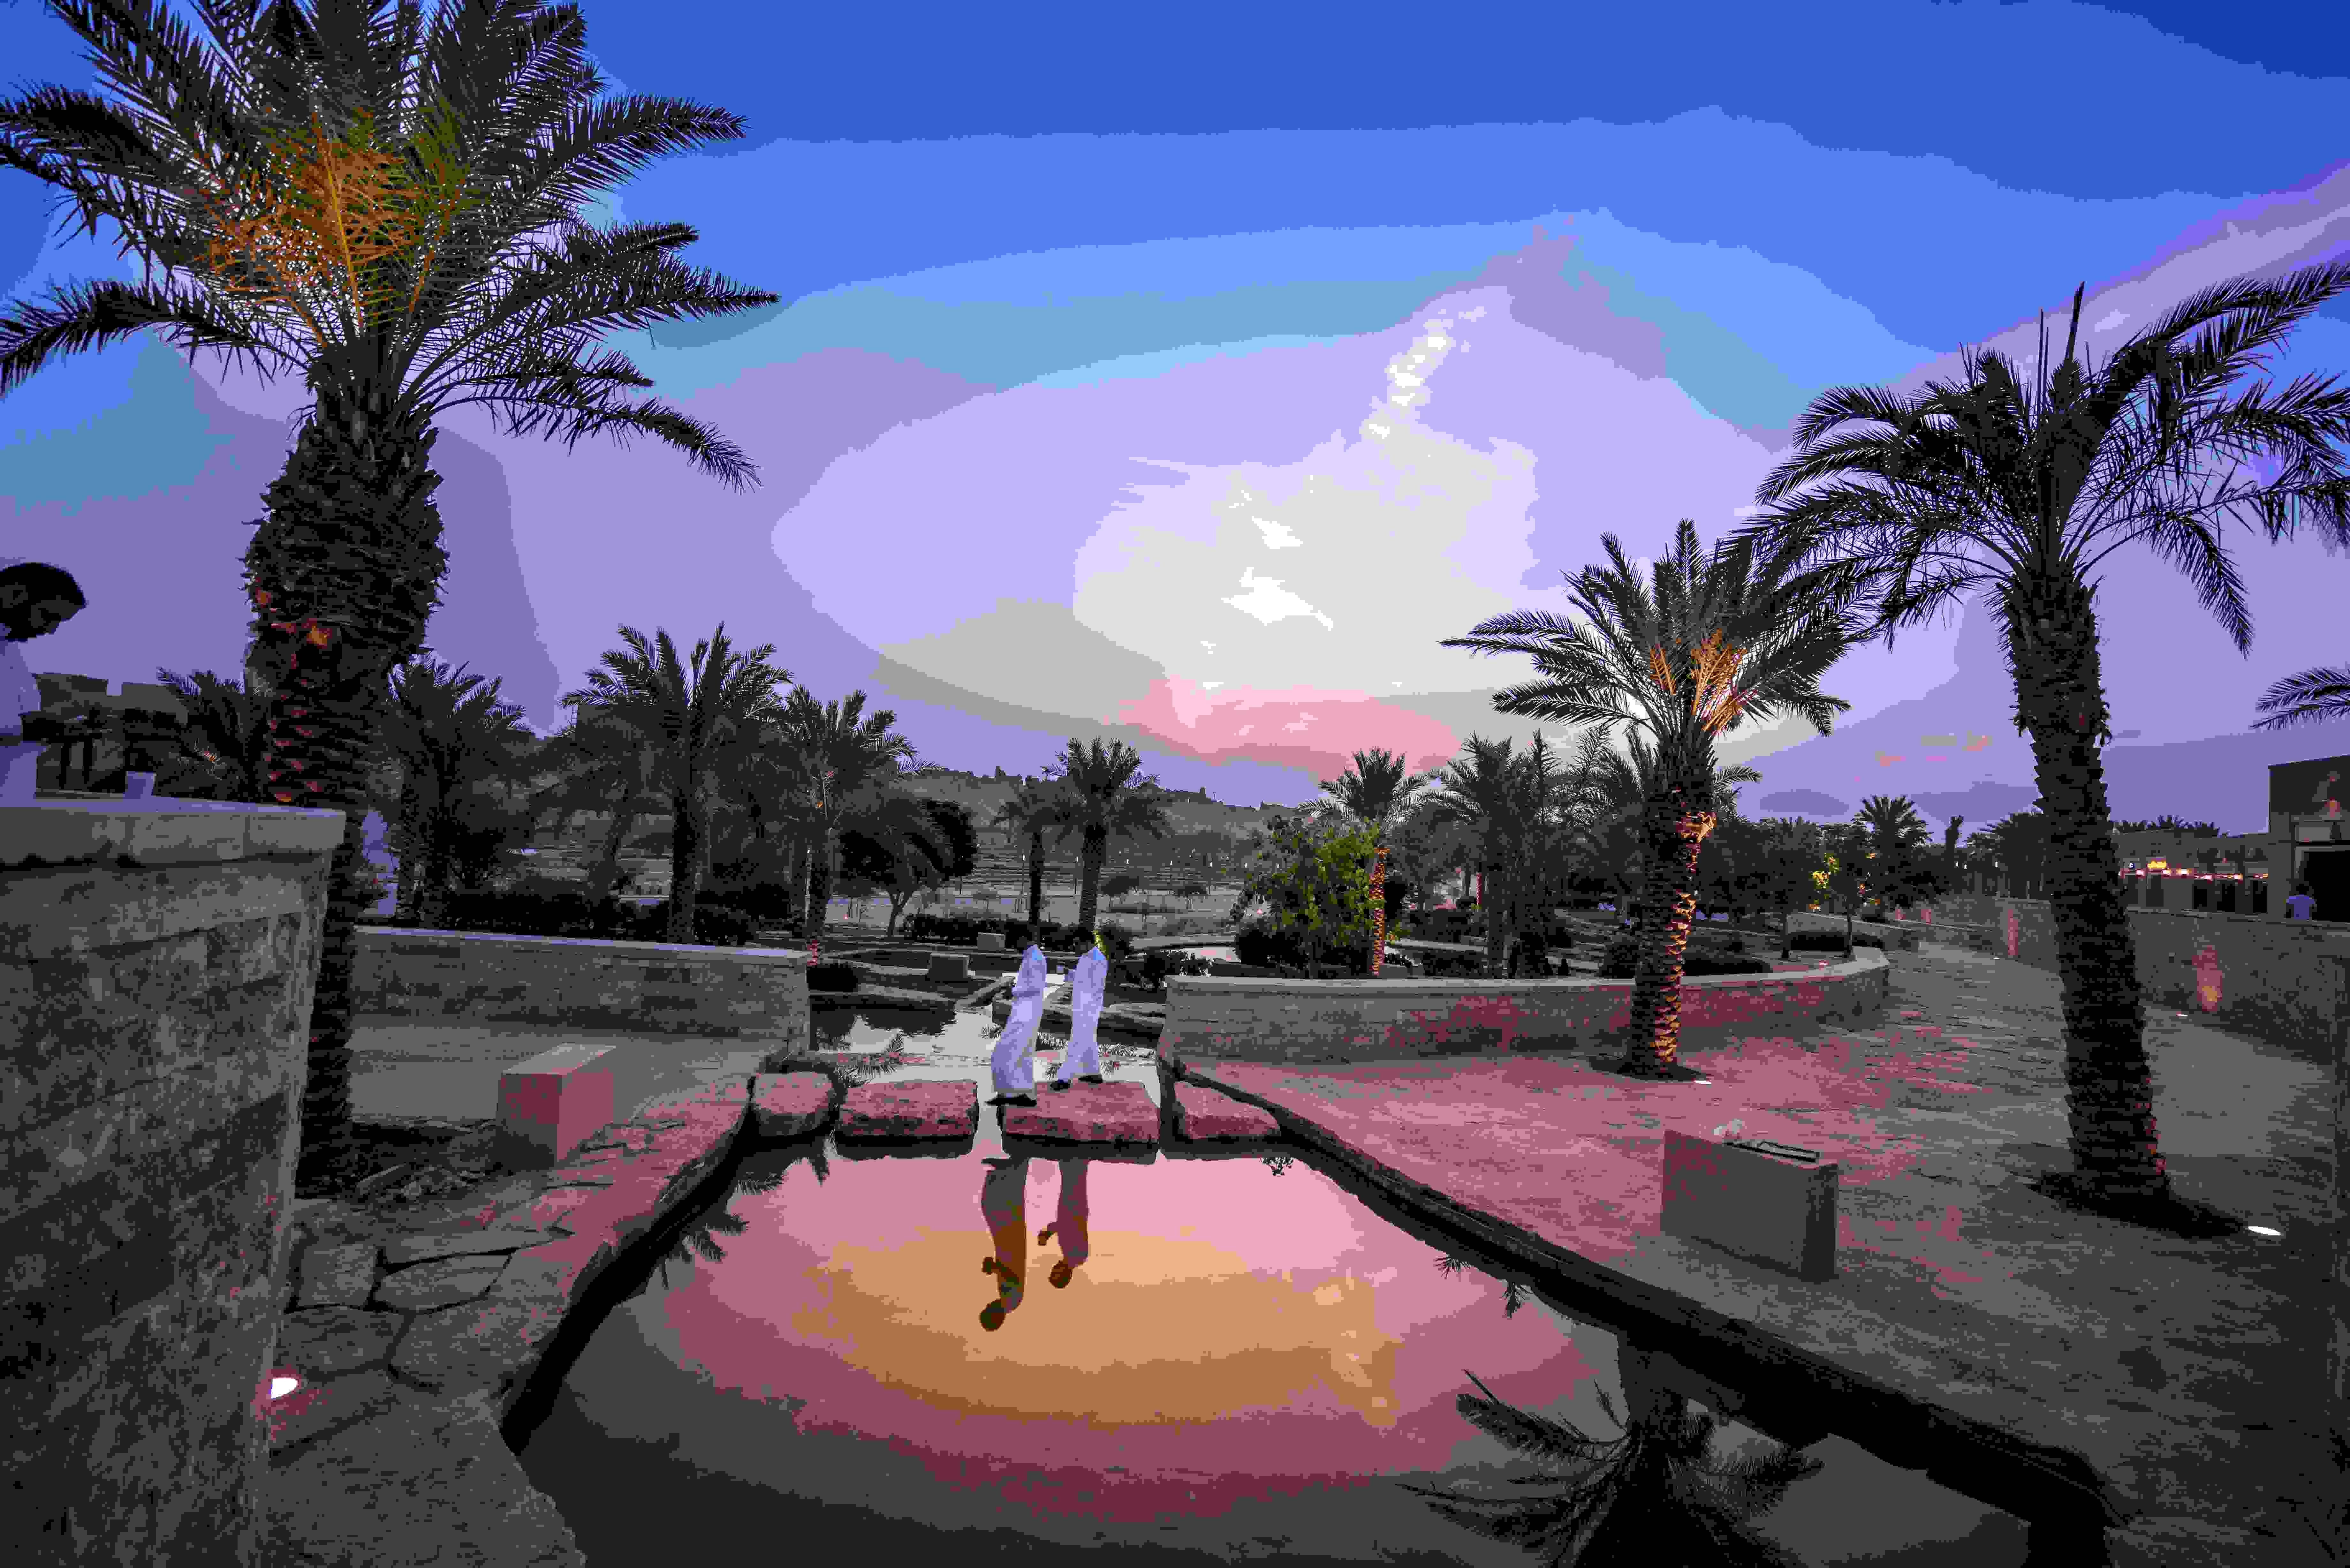 Le quarier Al Bujairi à Riyad. (Crédits photo : Eyeem)